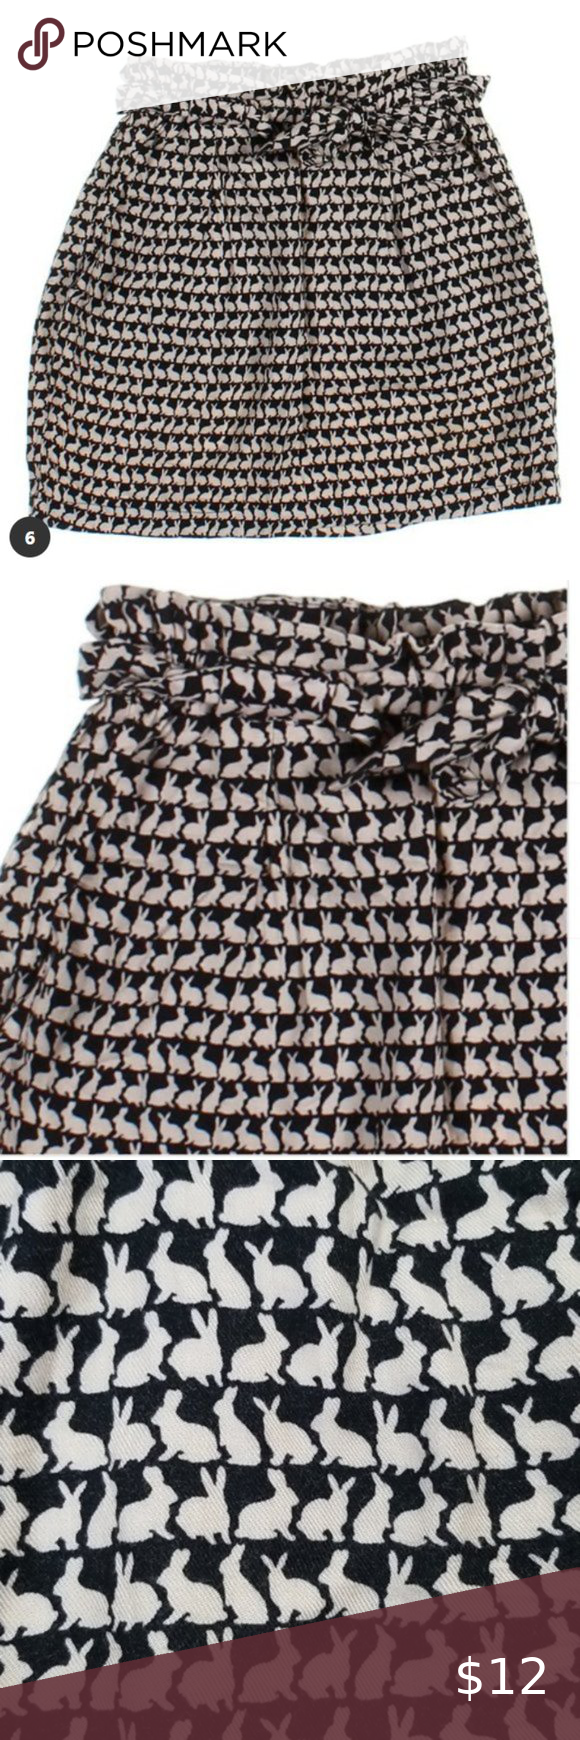 Bunny Print H M Black And Cream Dress Skirt In 2020 Trendy Skirts Cream Dress Dress Skirt [ 1740 x 580 Pixel ]